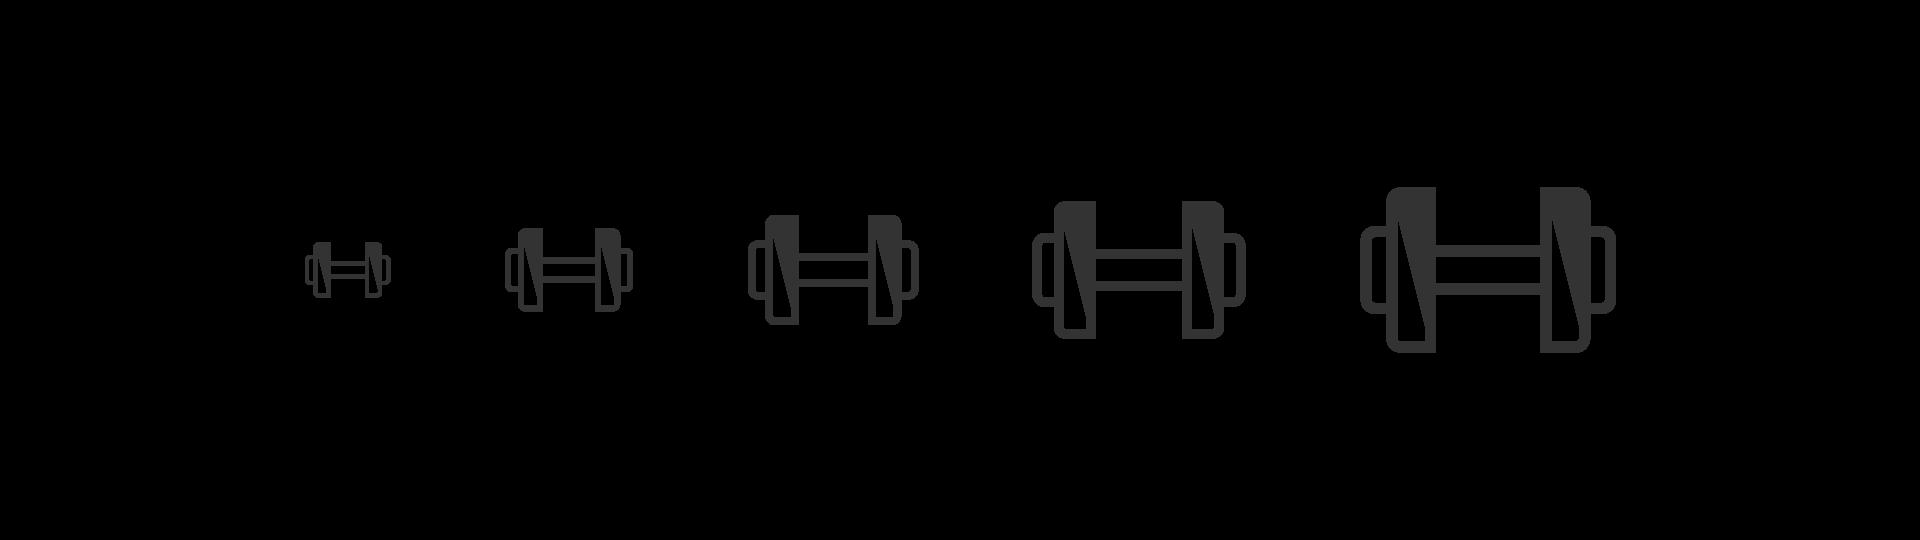 Exercise_Icon-Set_Scaleable